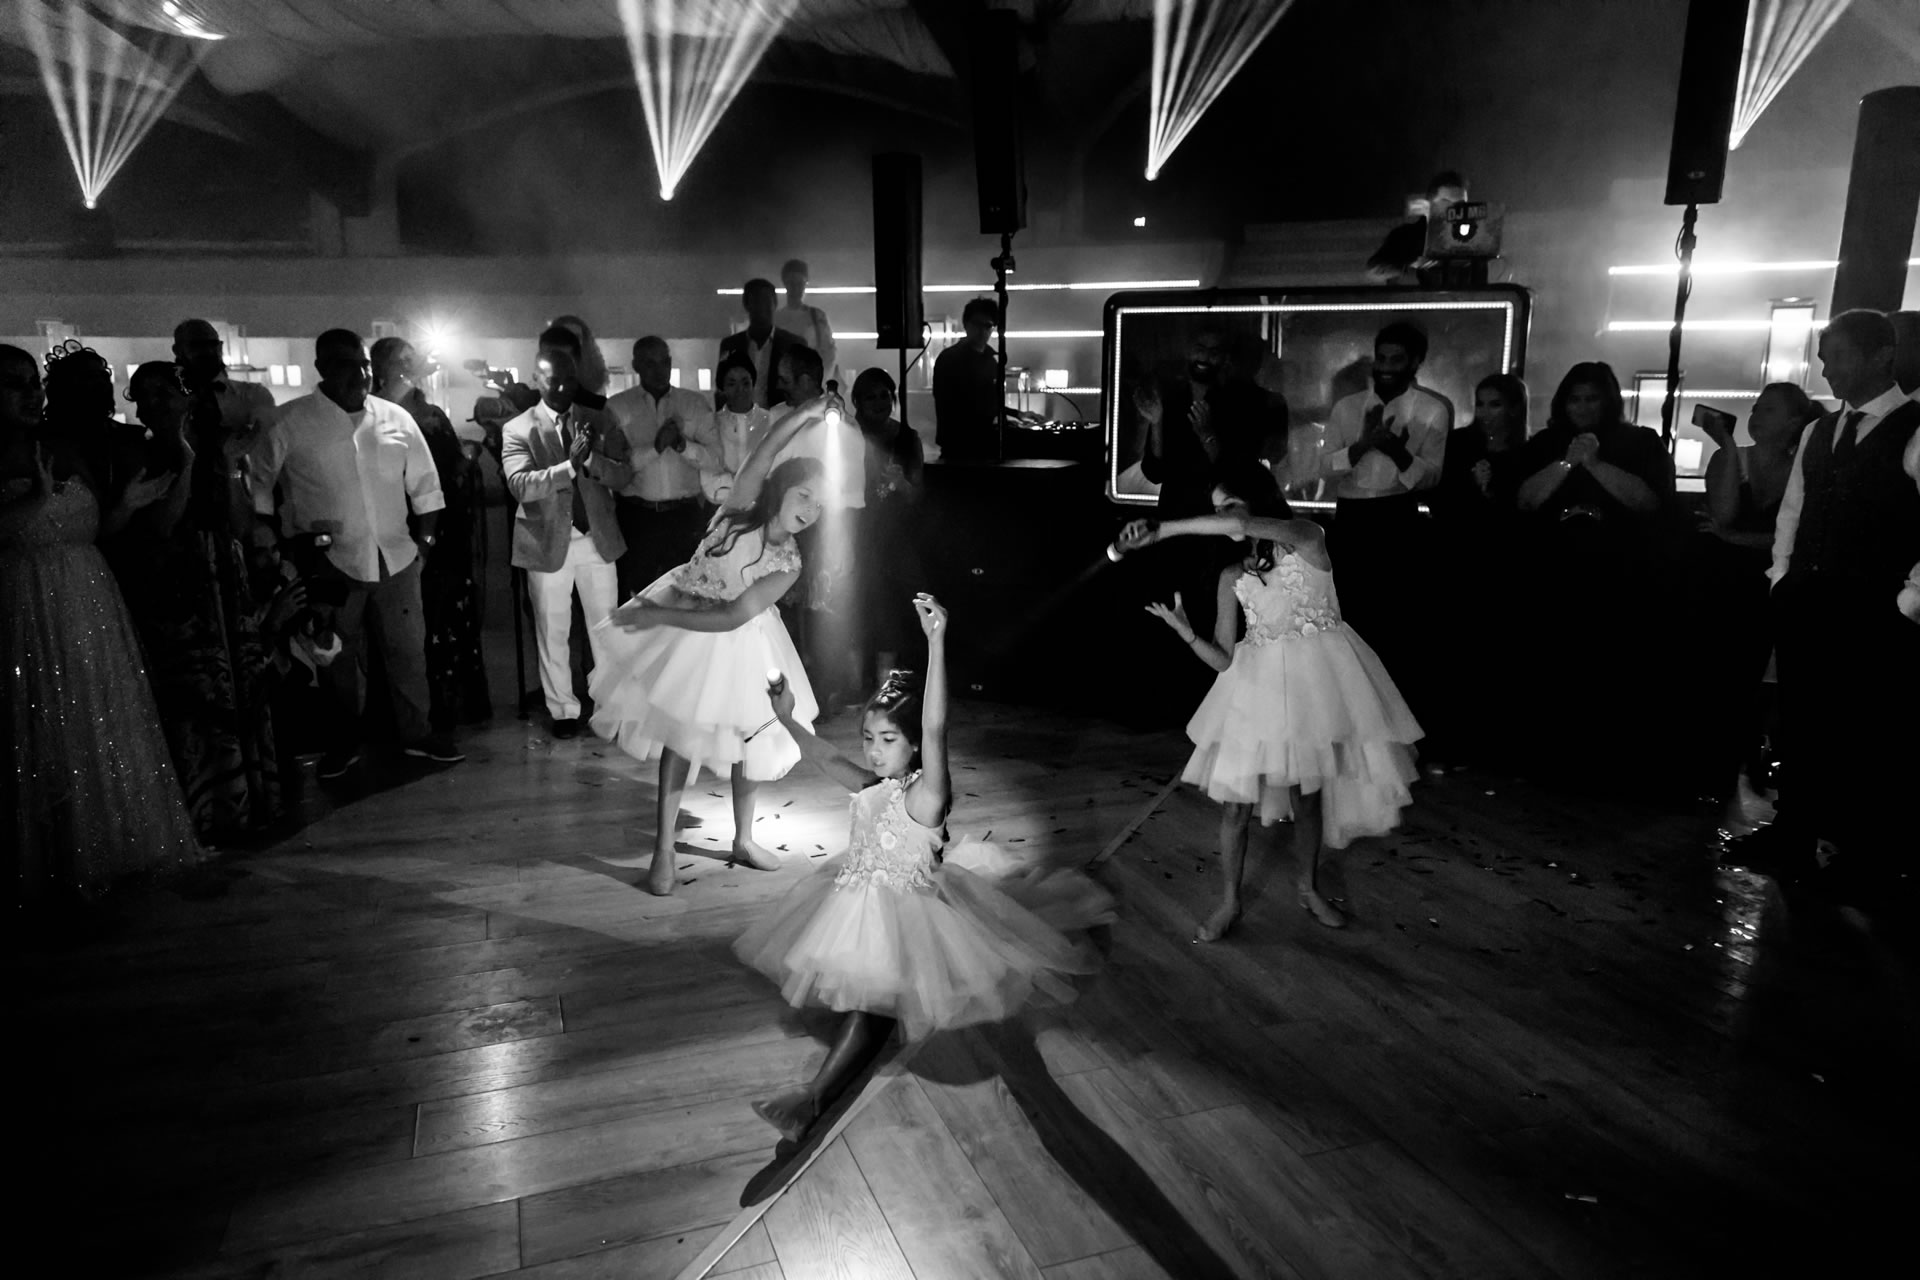 Girls - 84 :: Luxury wedding at Il Borro :: Luxury wedding photography - 83 :: Girls - 84